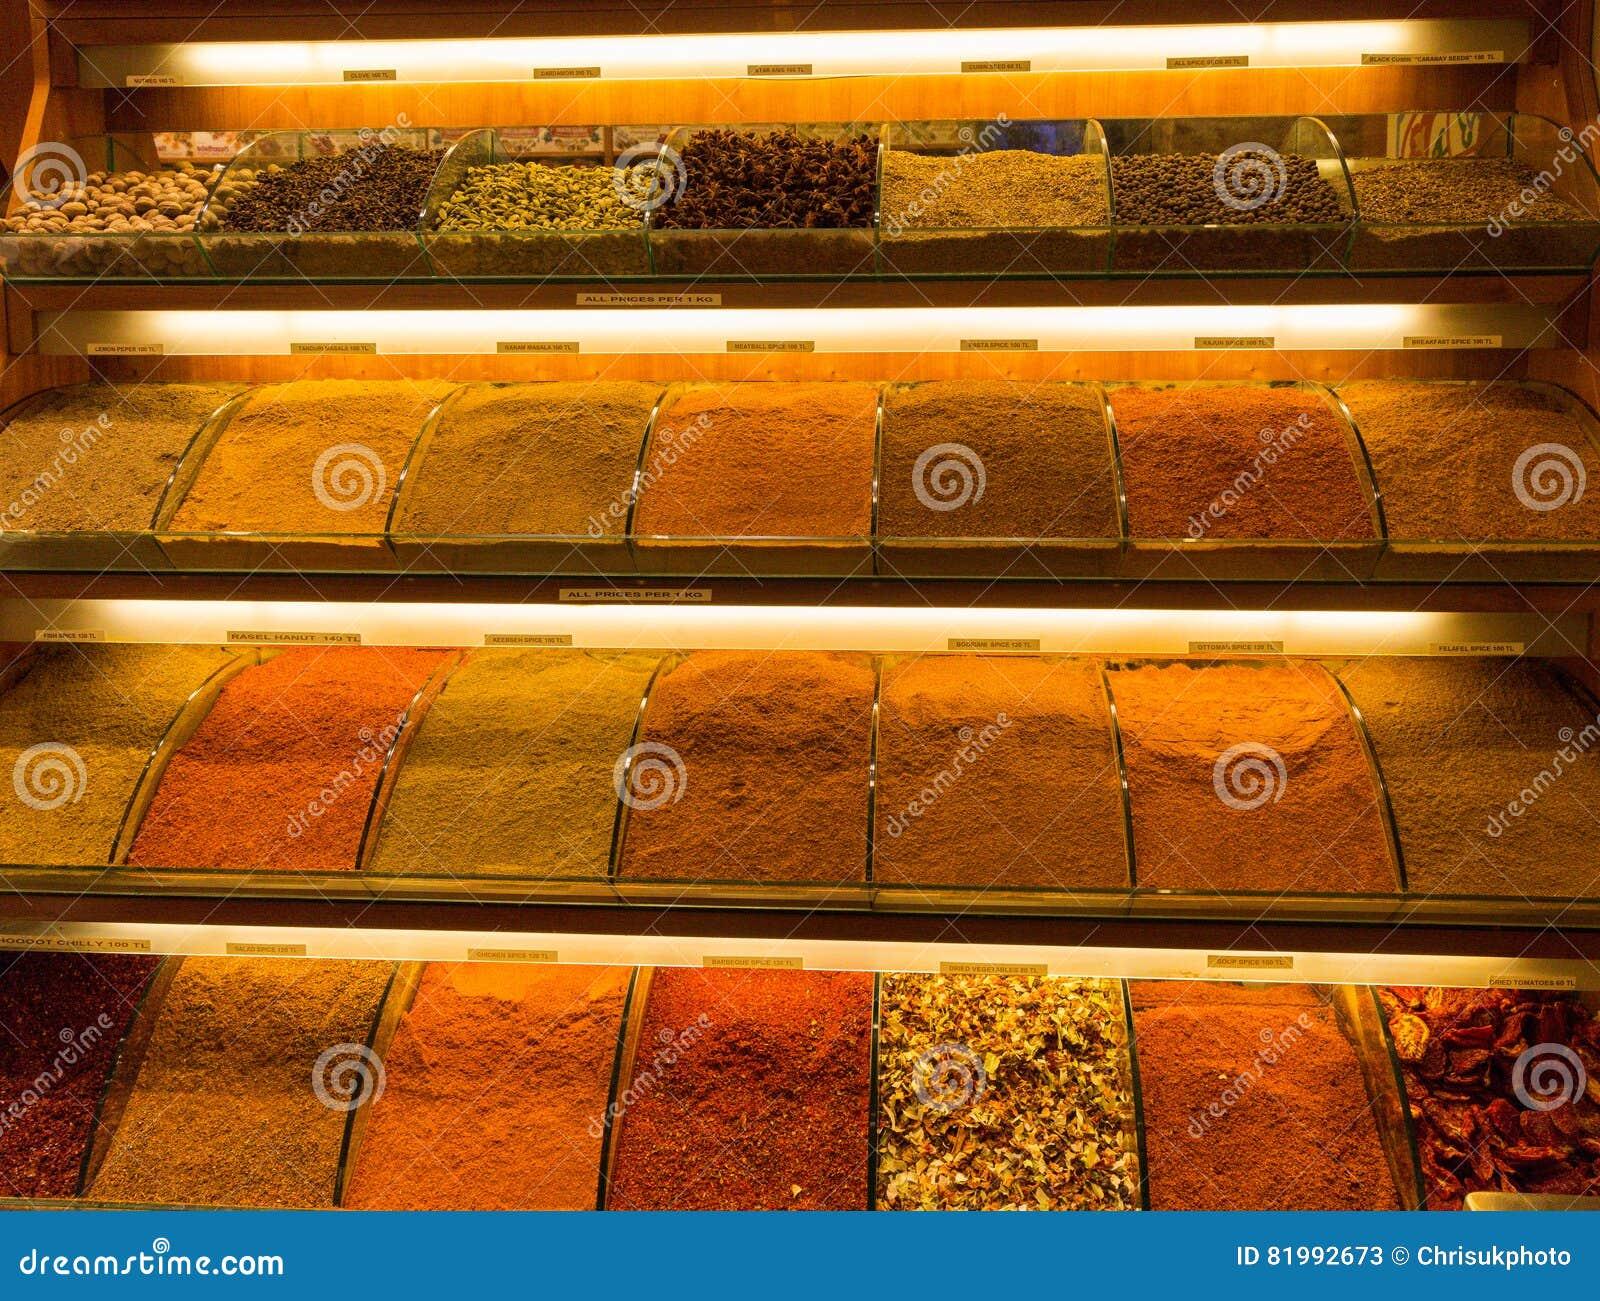 Especiarias no mercado em Istambul